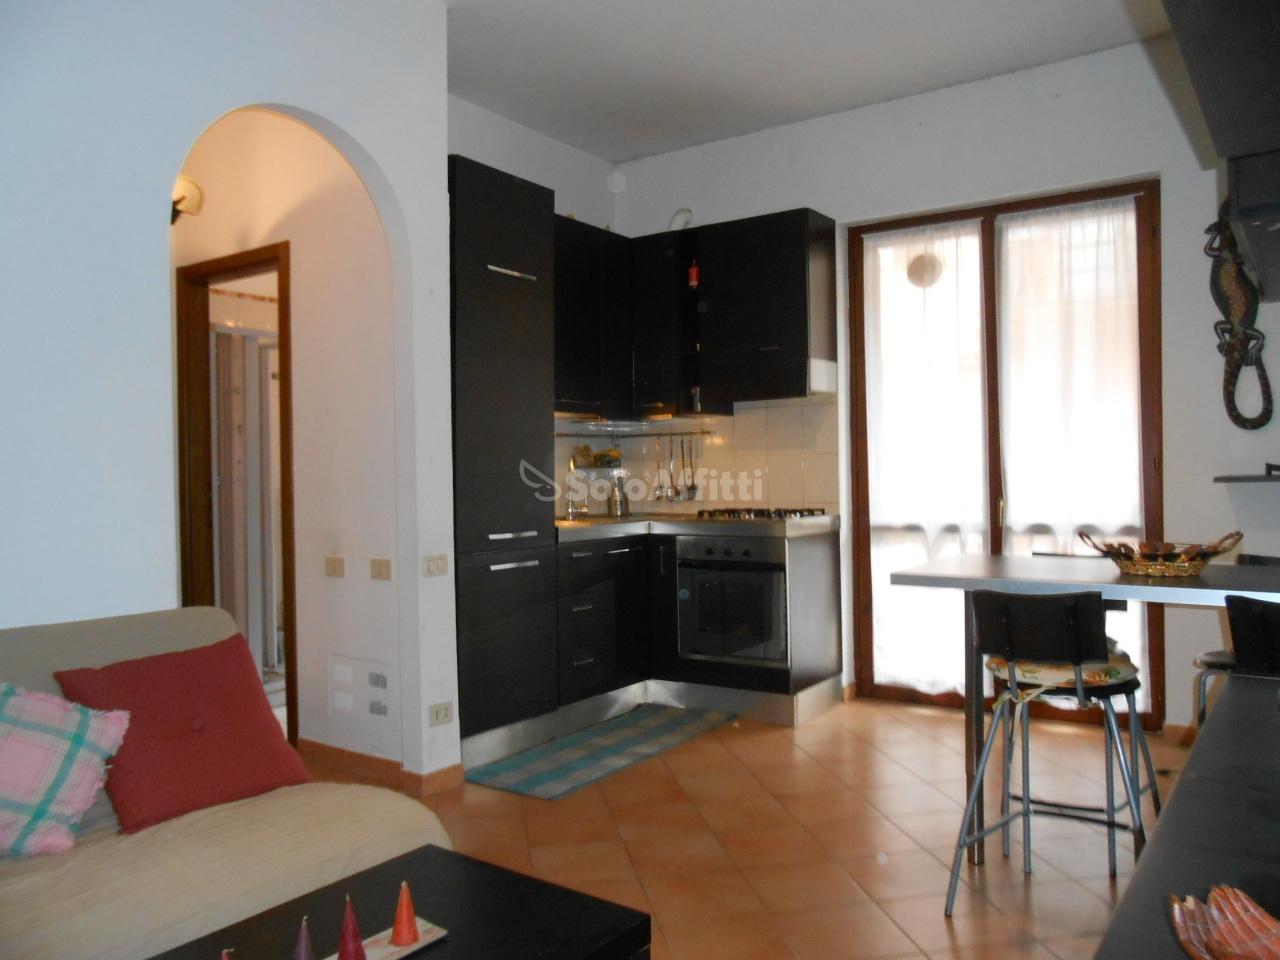 Bilocale Marino Via Nettunense Vecchia 1 1